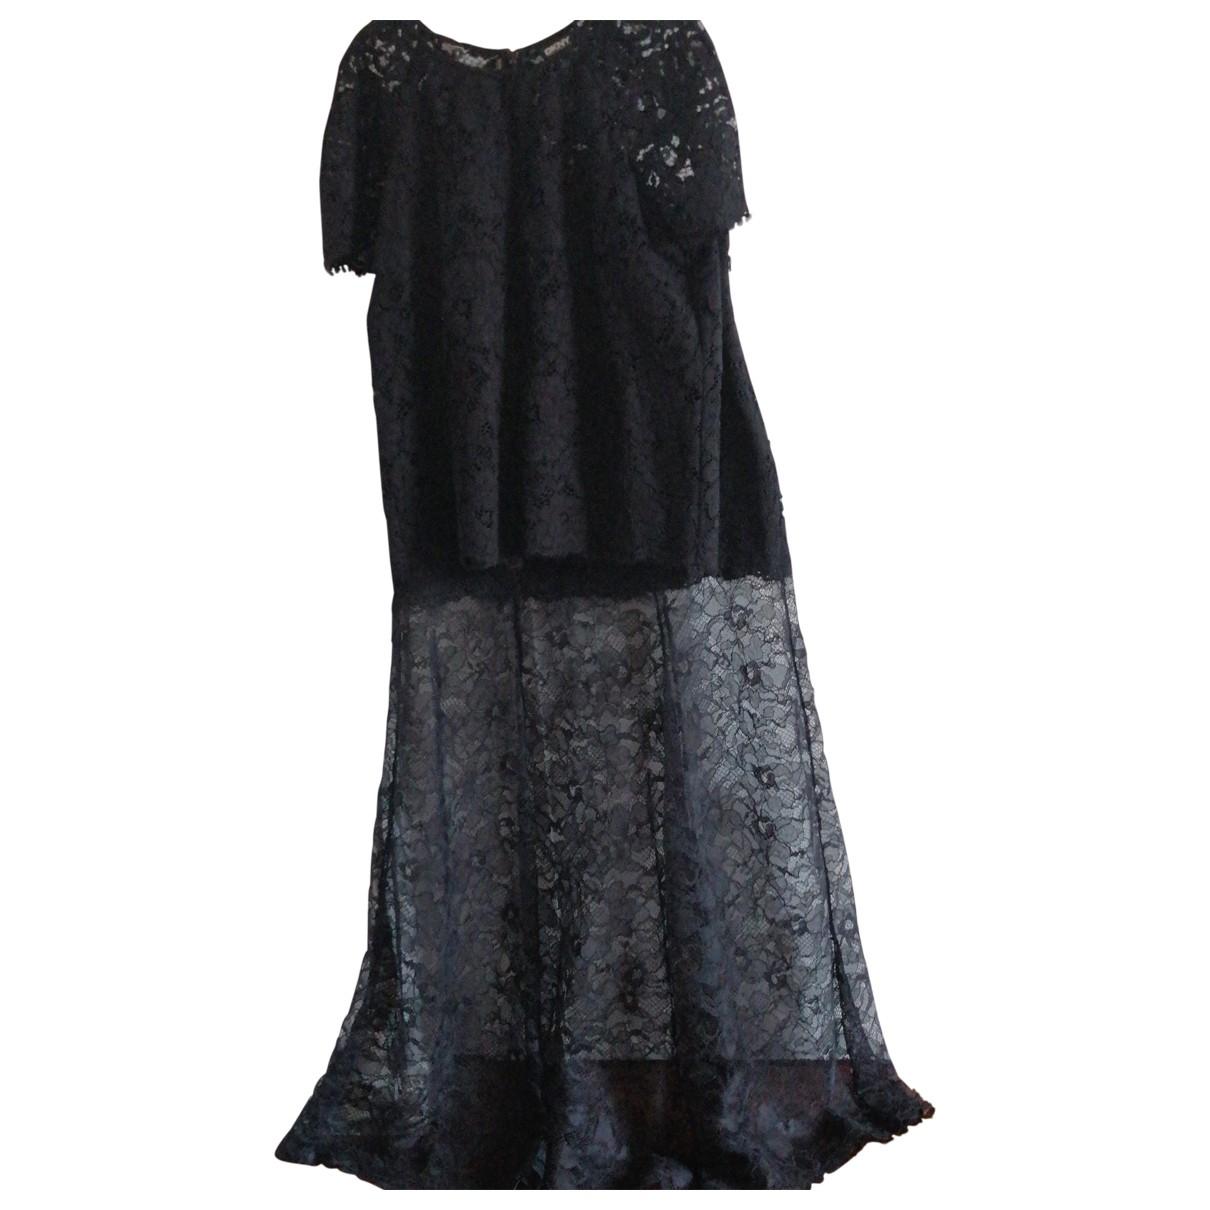 Donna Karan \N Black Cotton dress for Women 6 US